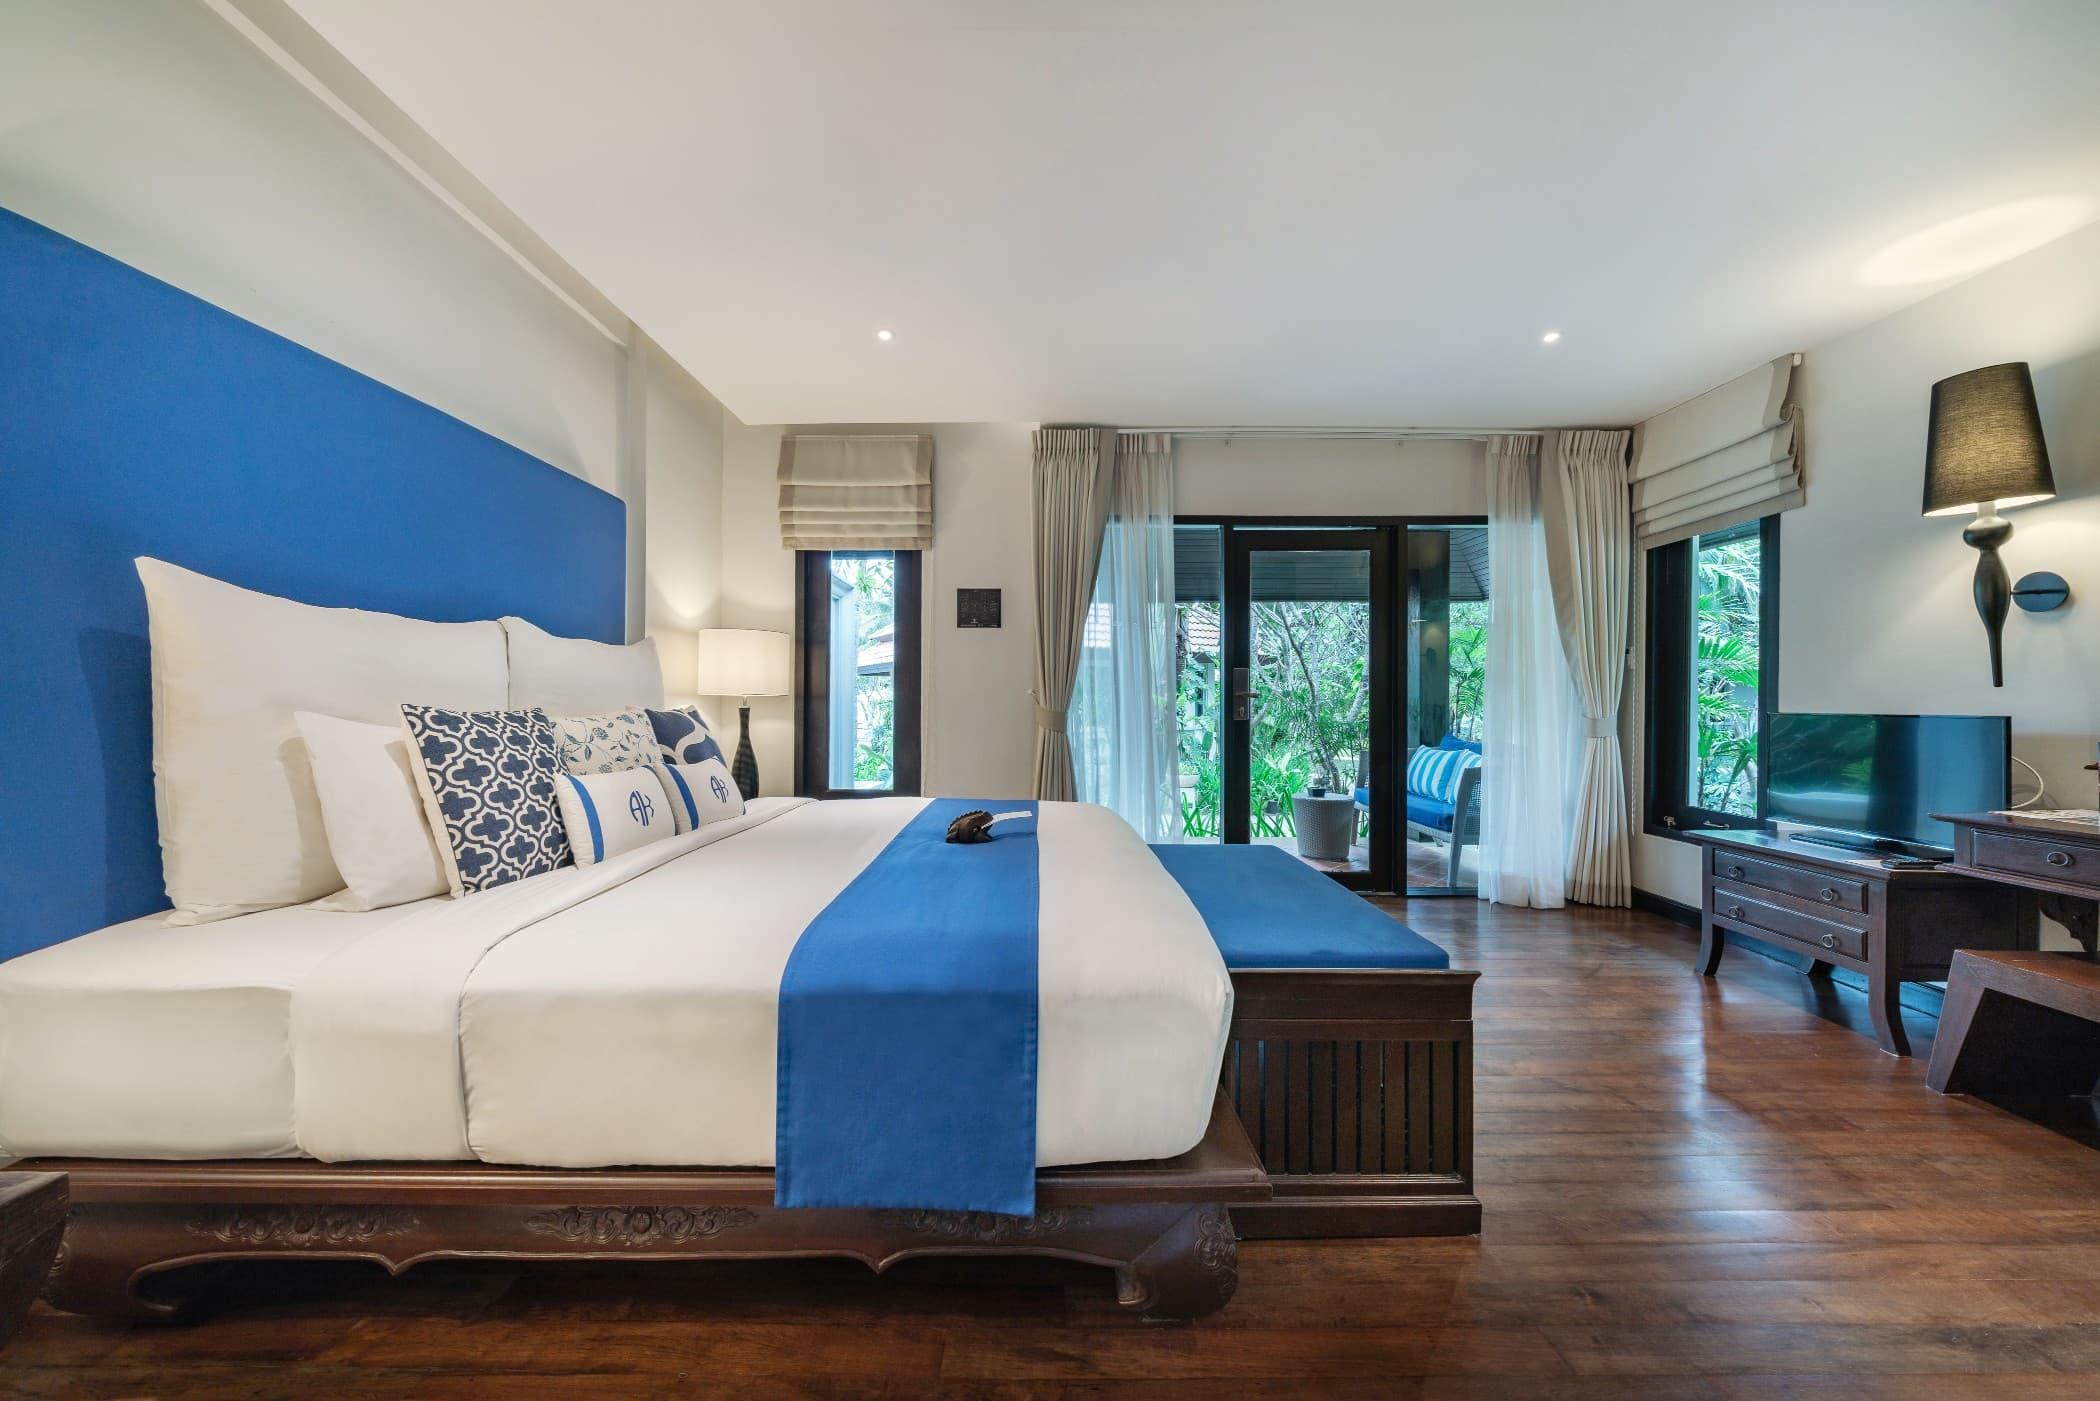 Garden Villa with King Size Bed - akyra Beach Resort Phuket